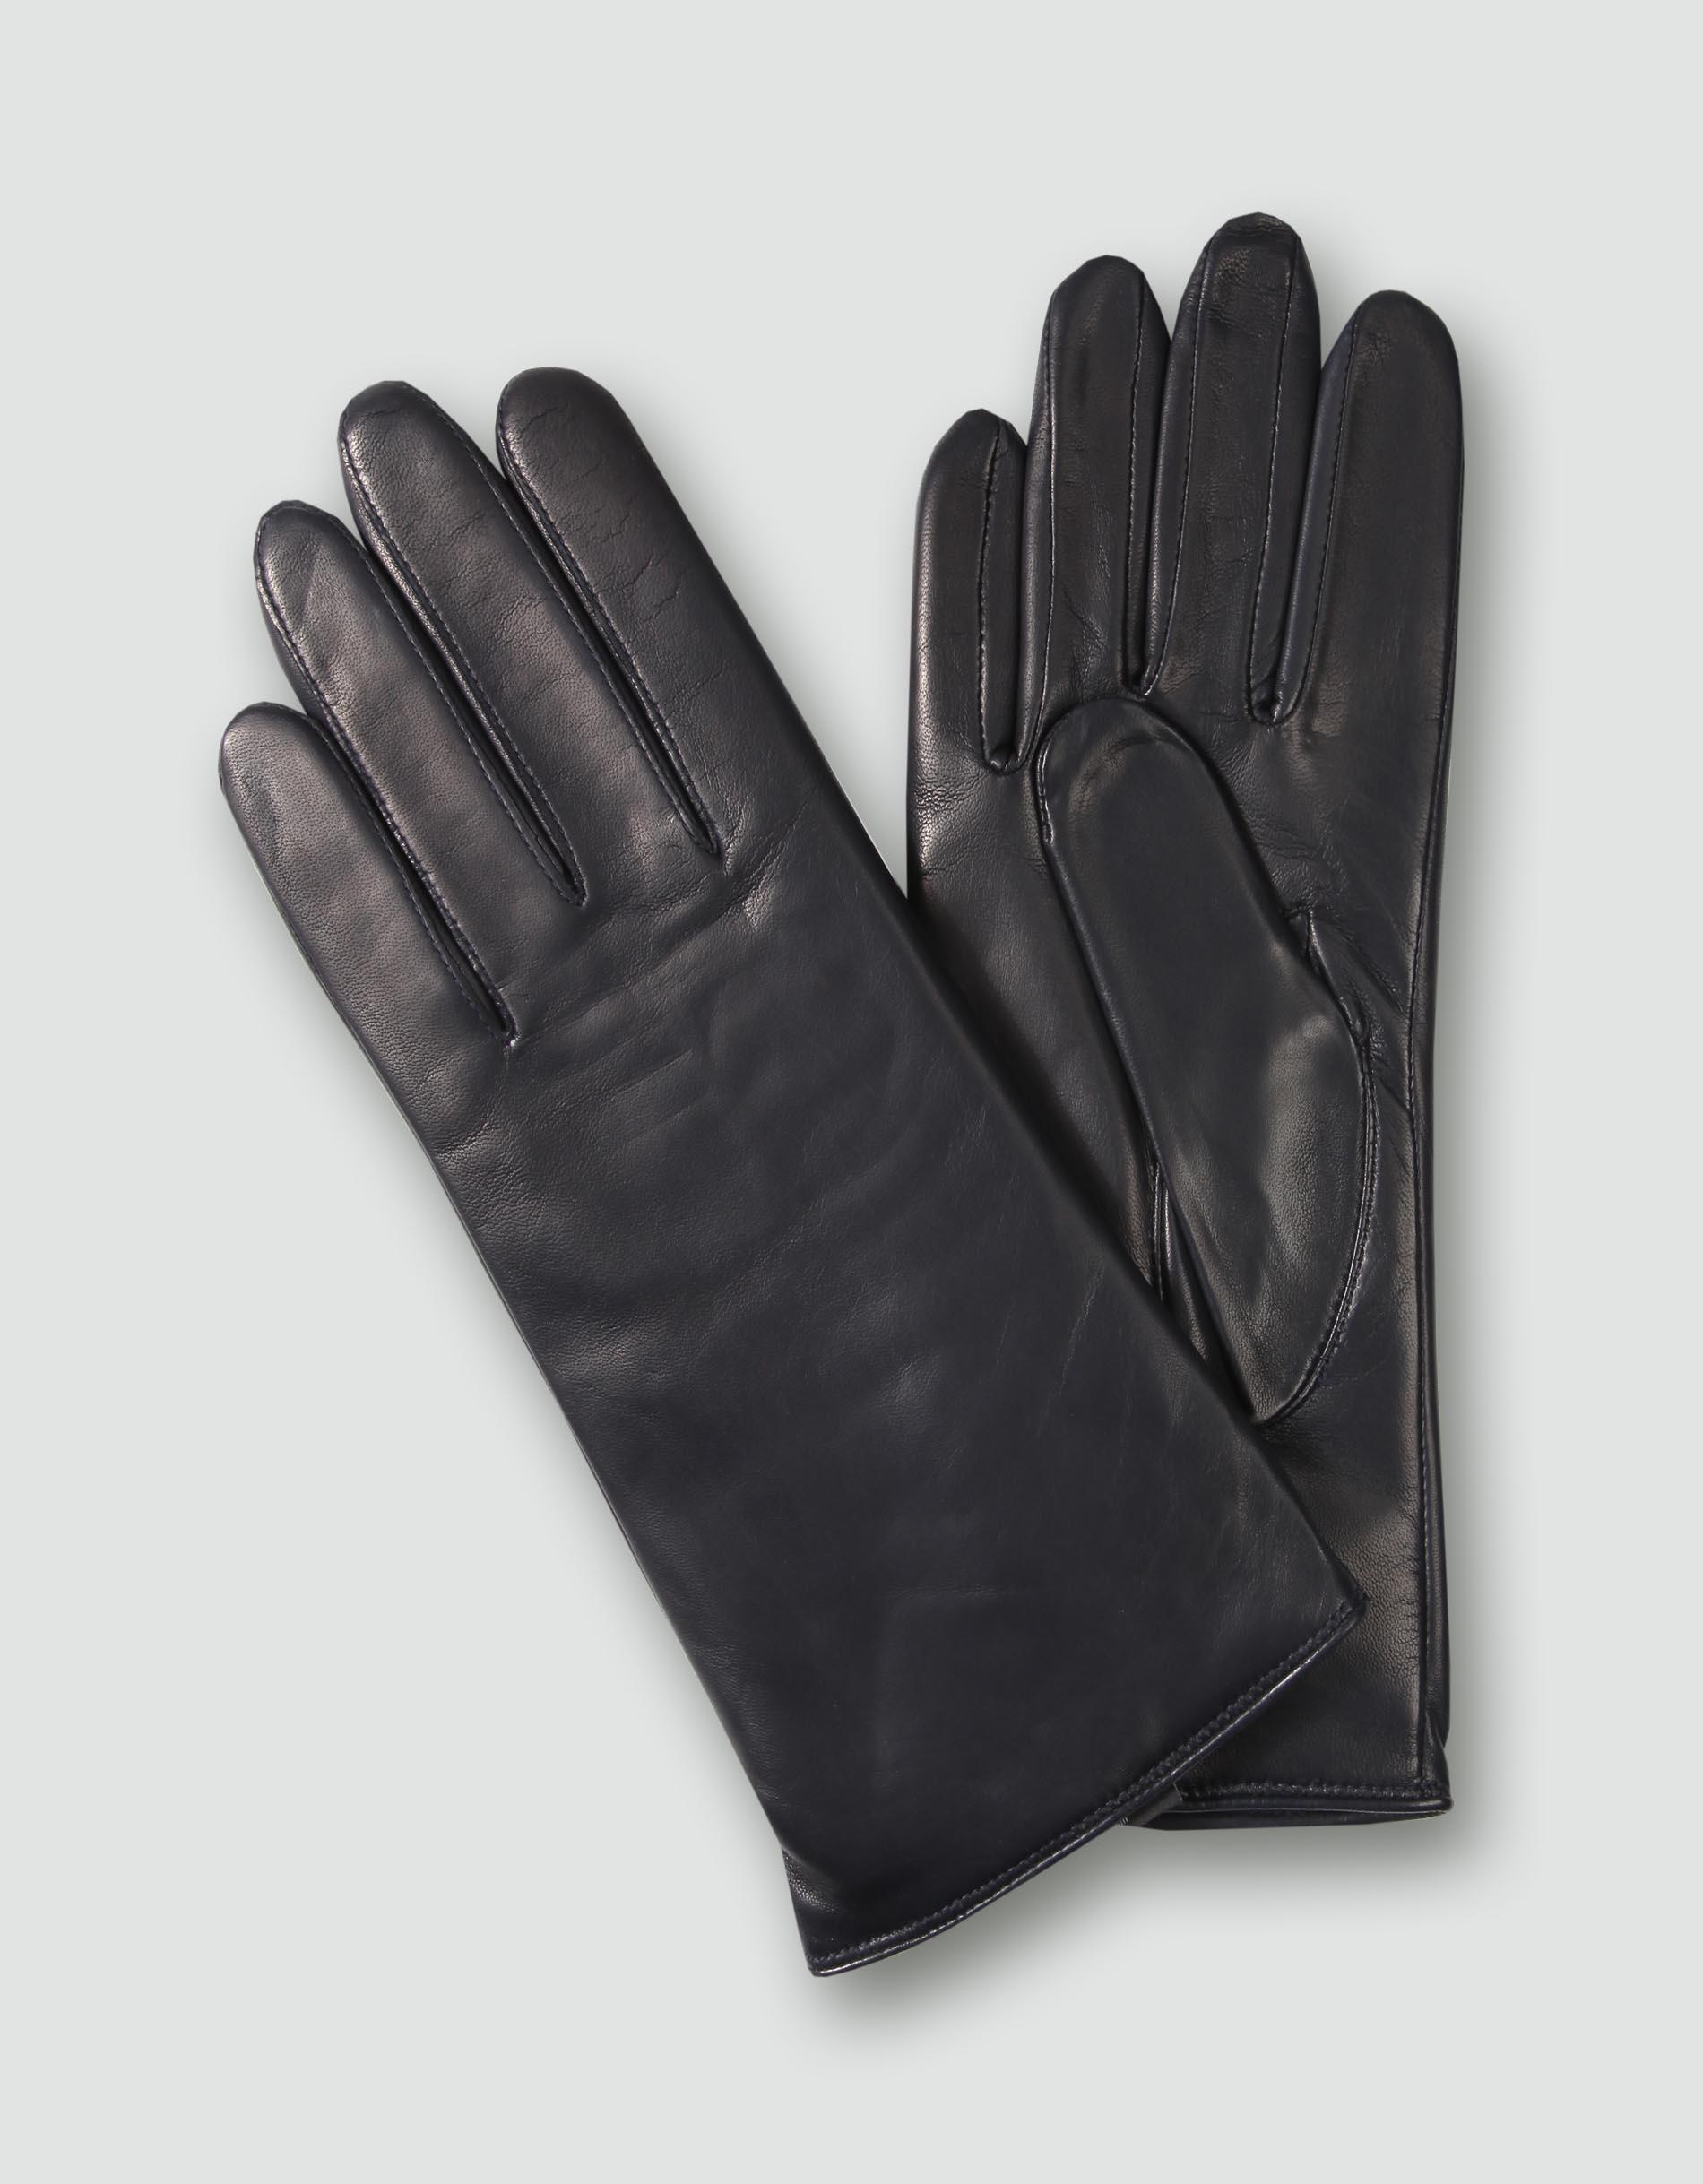 roeckl damen handschuhe schafnappa woll strickfutter. Black Bedroom Furniture Sets. Home Design Ideas